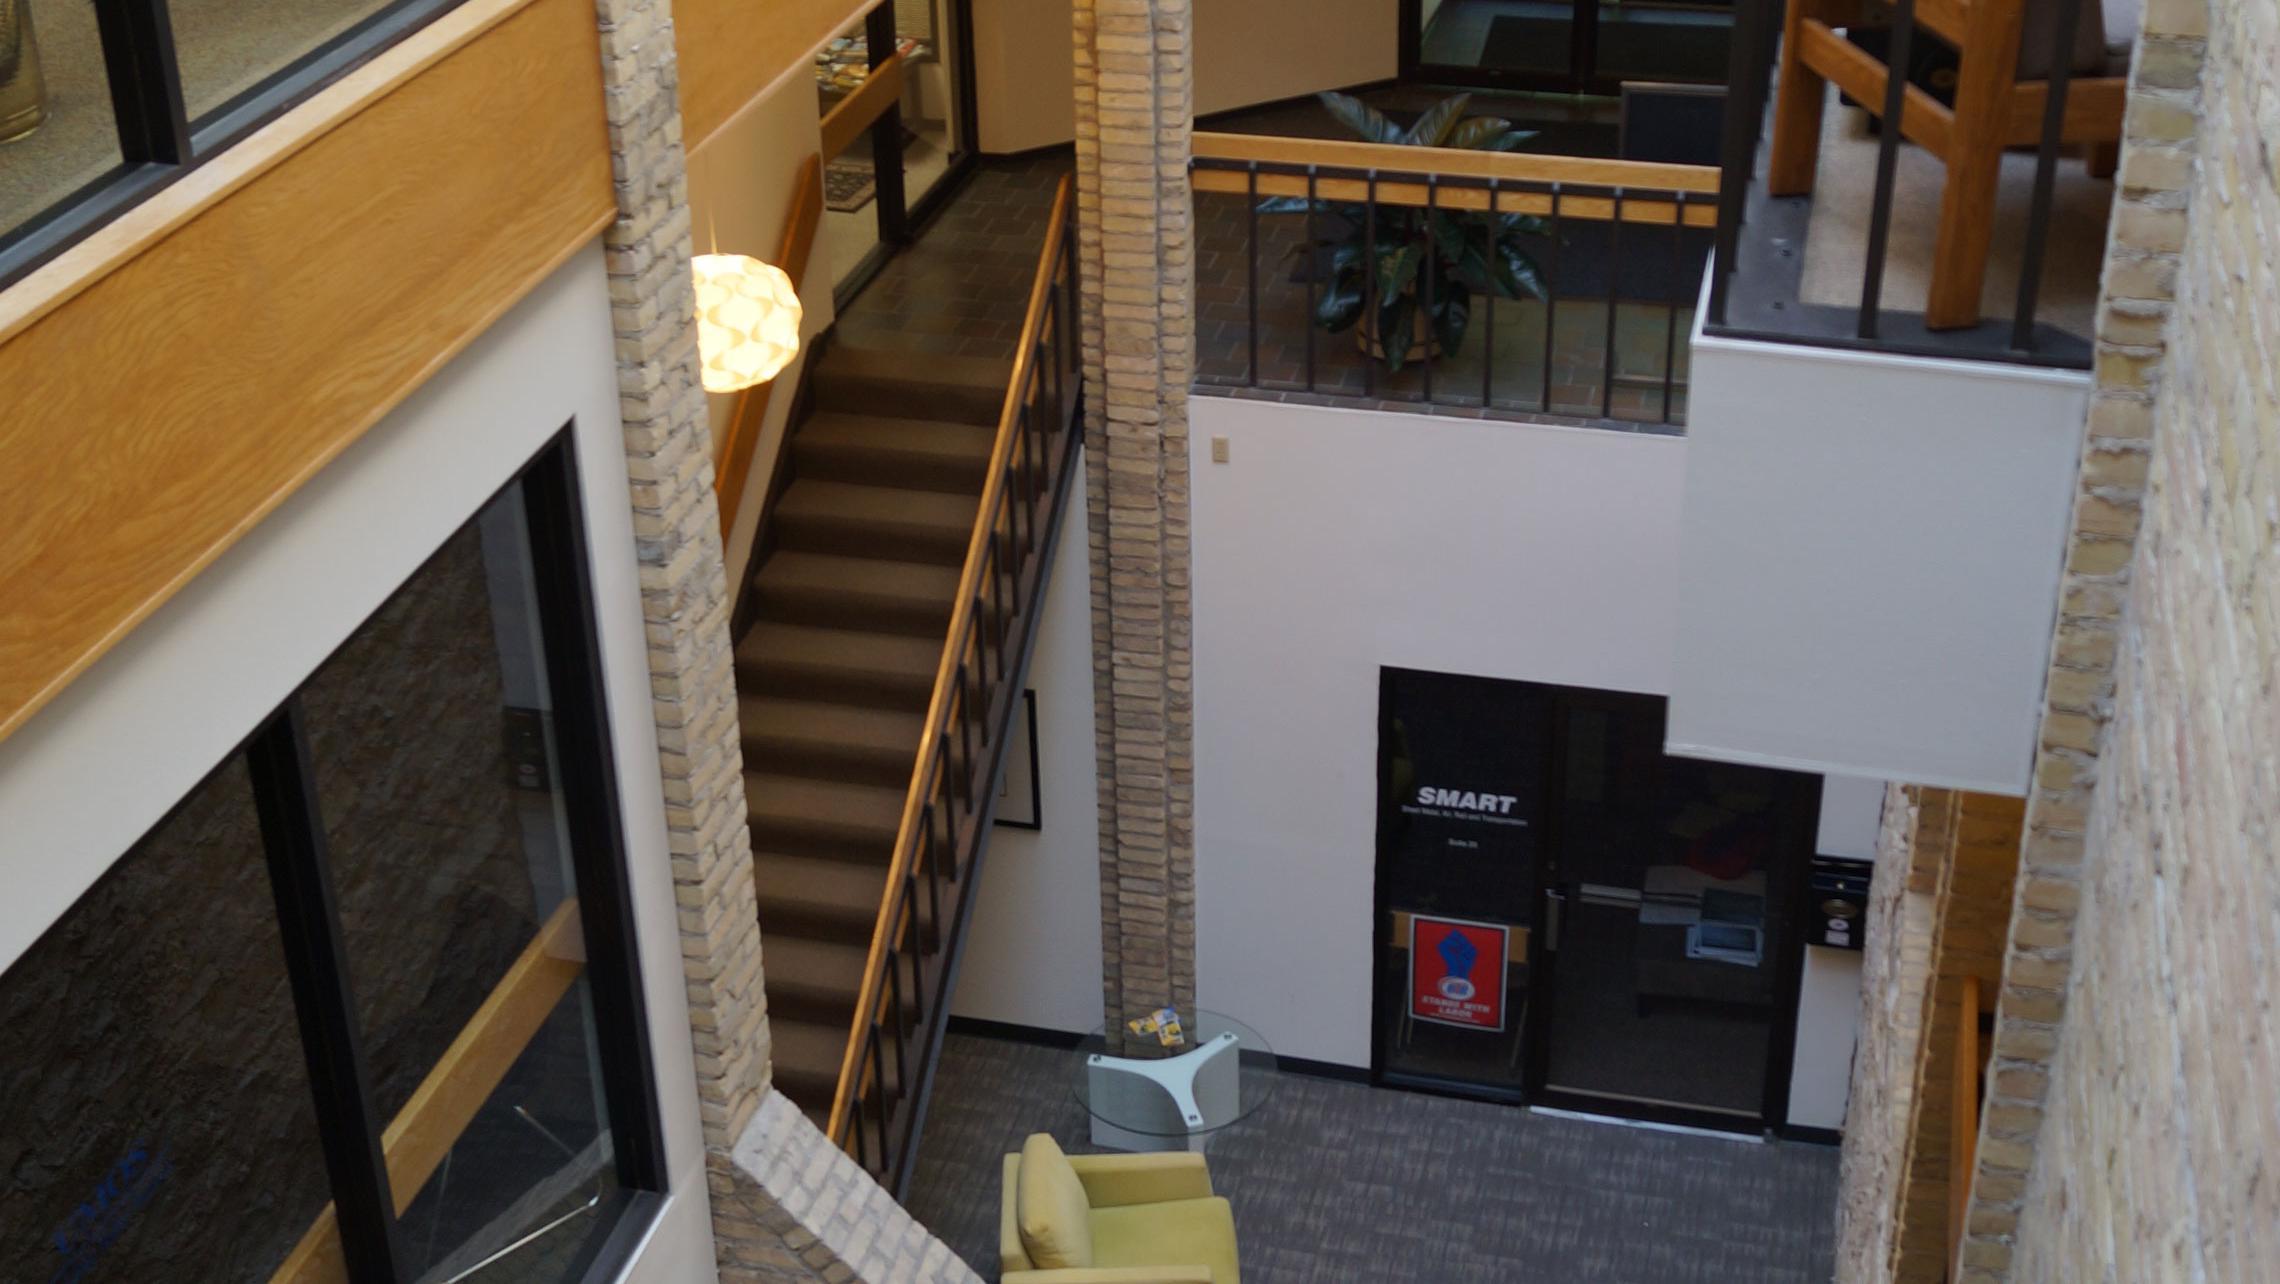 ULI Centre 7 Atrium Office Building